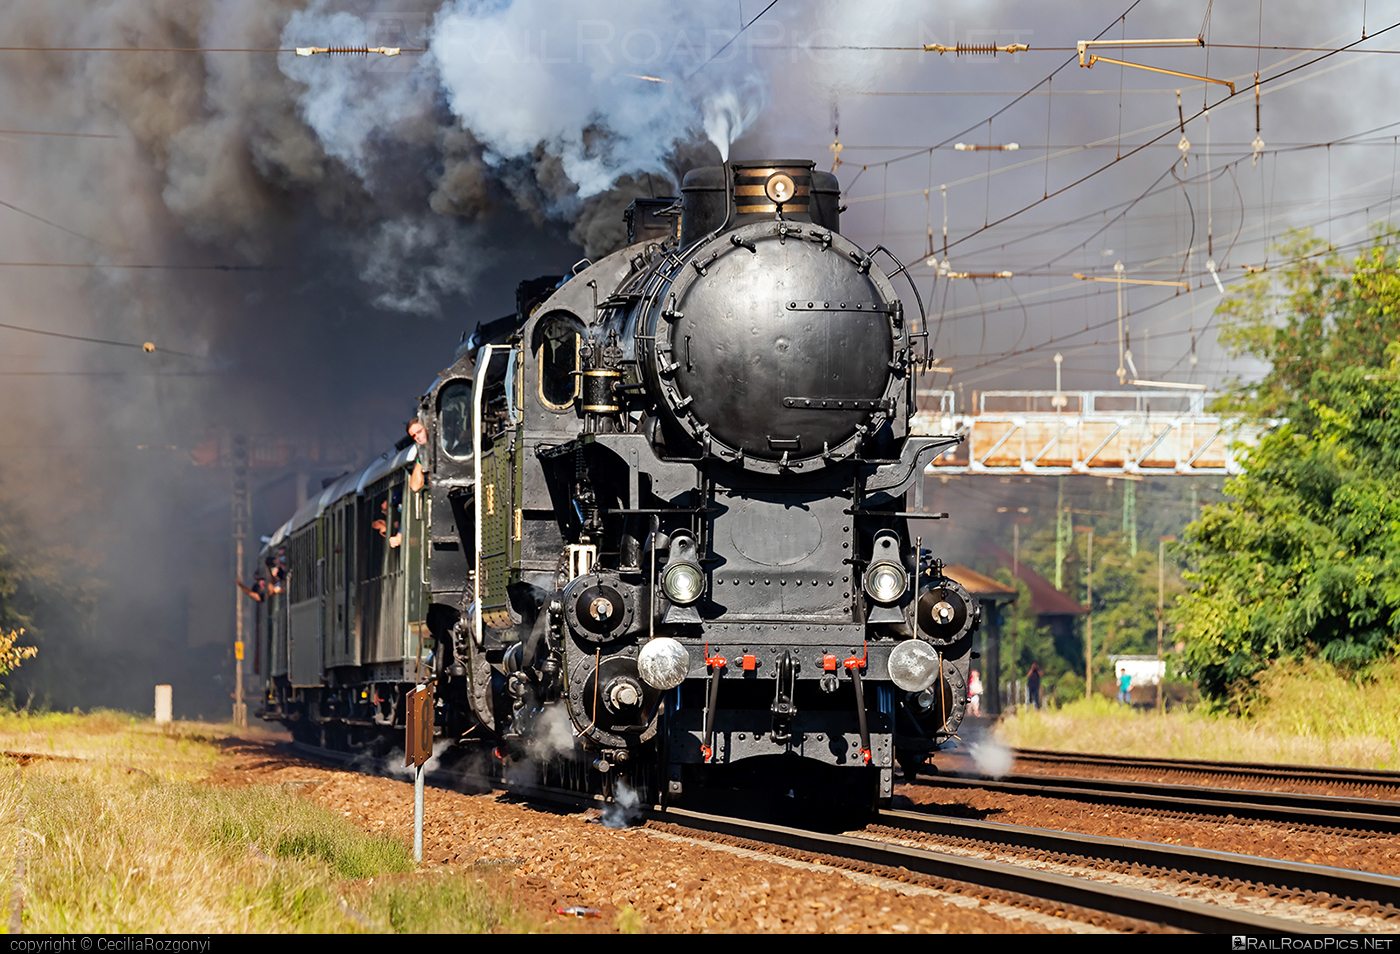 MÁVAG Class 424 - 424.009 operated by MÁV Nosztalgia Kft. #mavag #mavag424 #mavagclass424 #mavclass424 #mavnosztalgia #mavnosztalgiakft